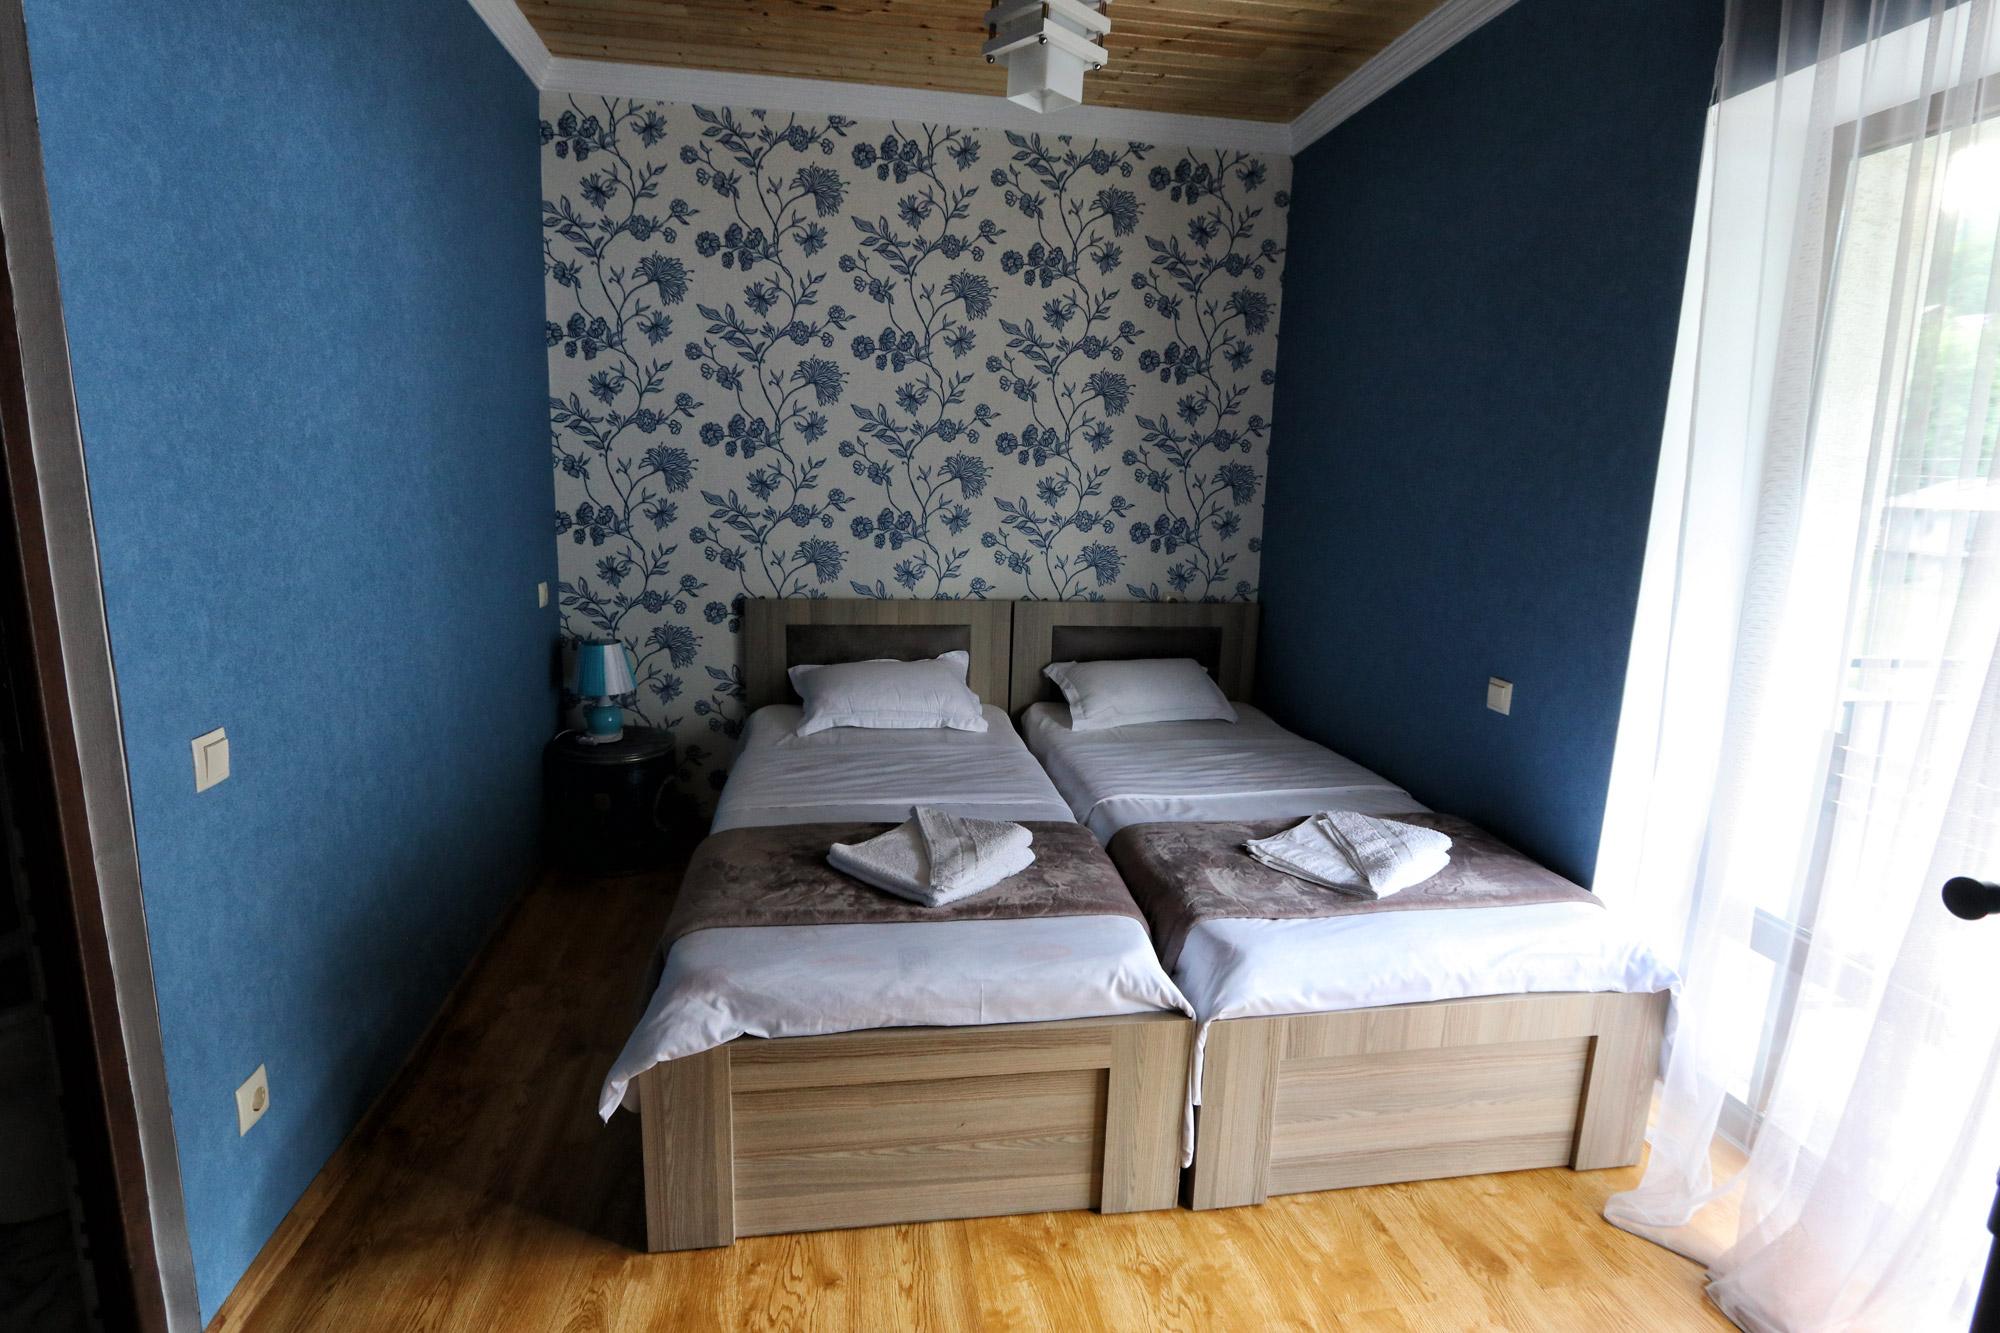 Kosten Georgië - Overnachten in homestays